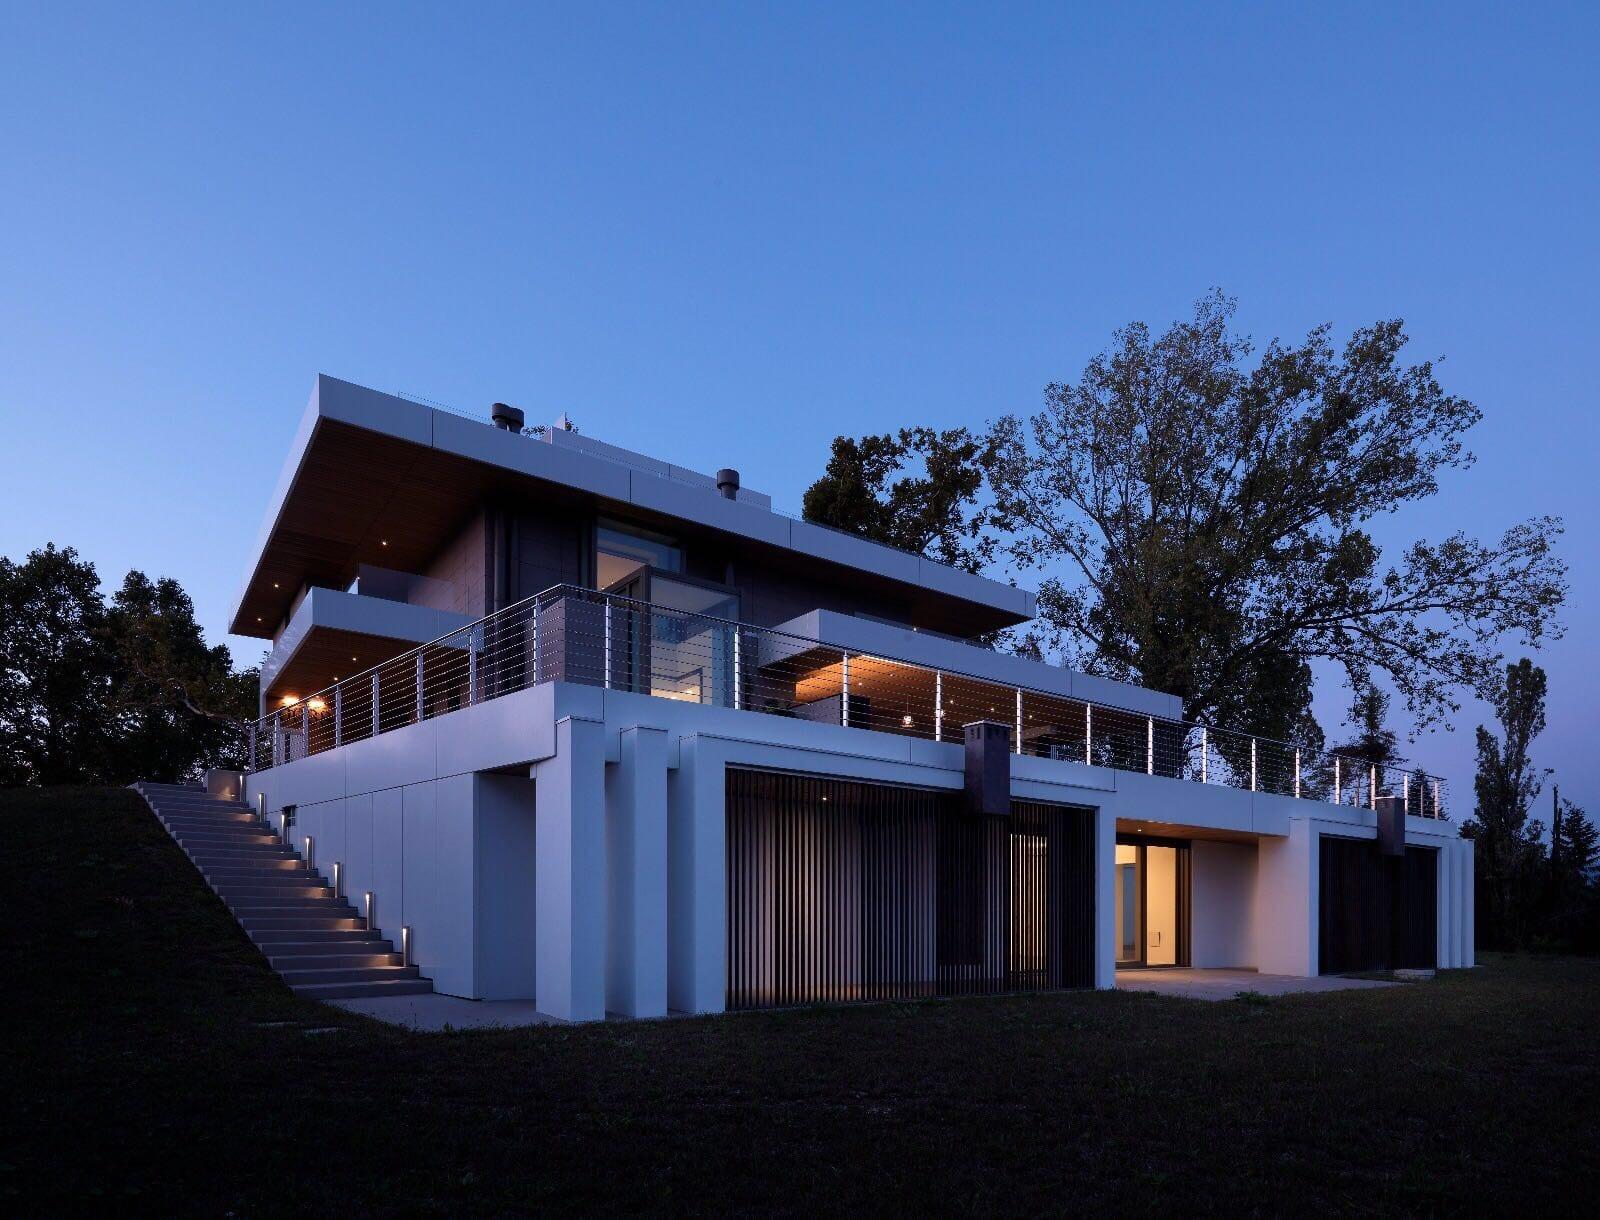 Una casa moderna ed efficiente costruita dall'impresa edile Del Bianco di Udine